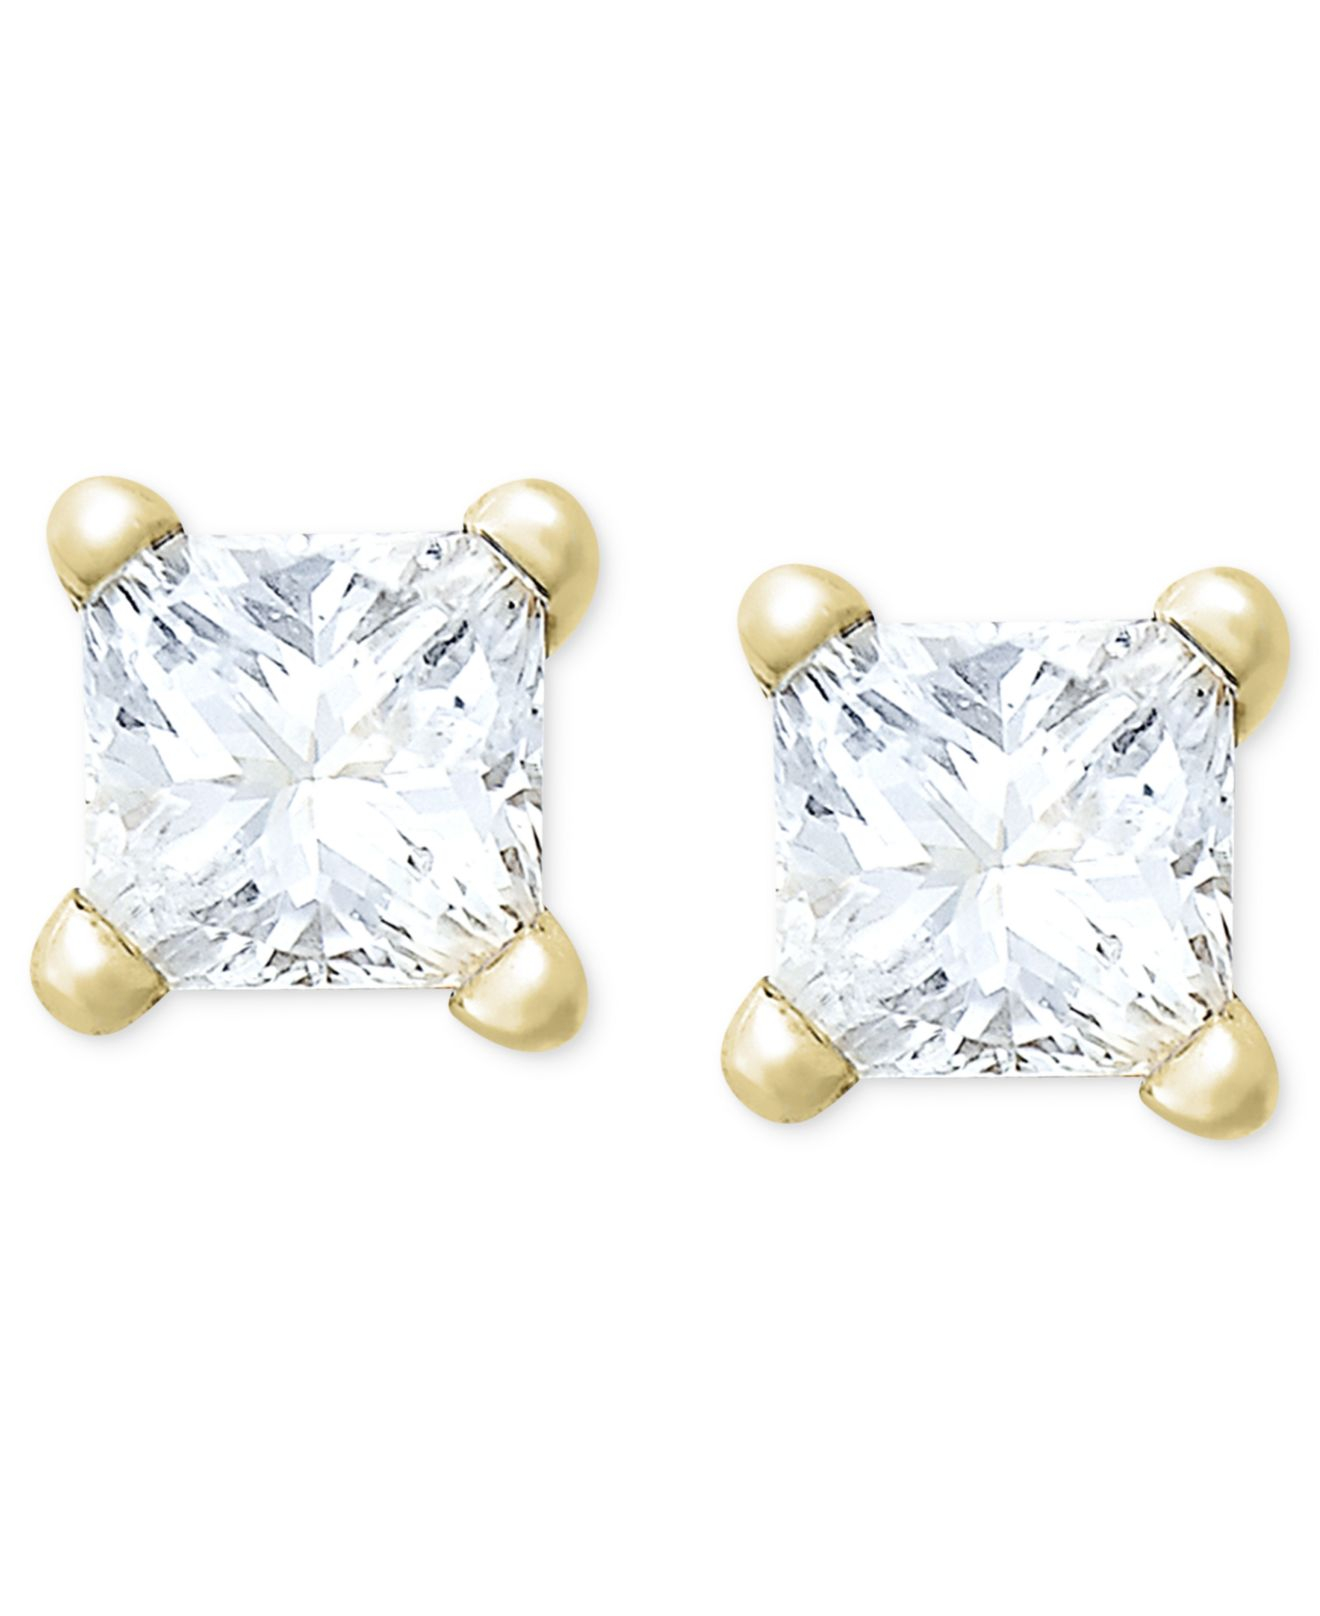 macy 39 s princess cut diamond stud earrings in 10k yellow or. Black Bedroom Furniture Sets. Home Design Ideas